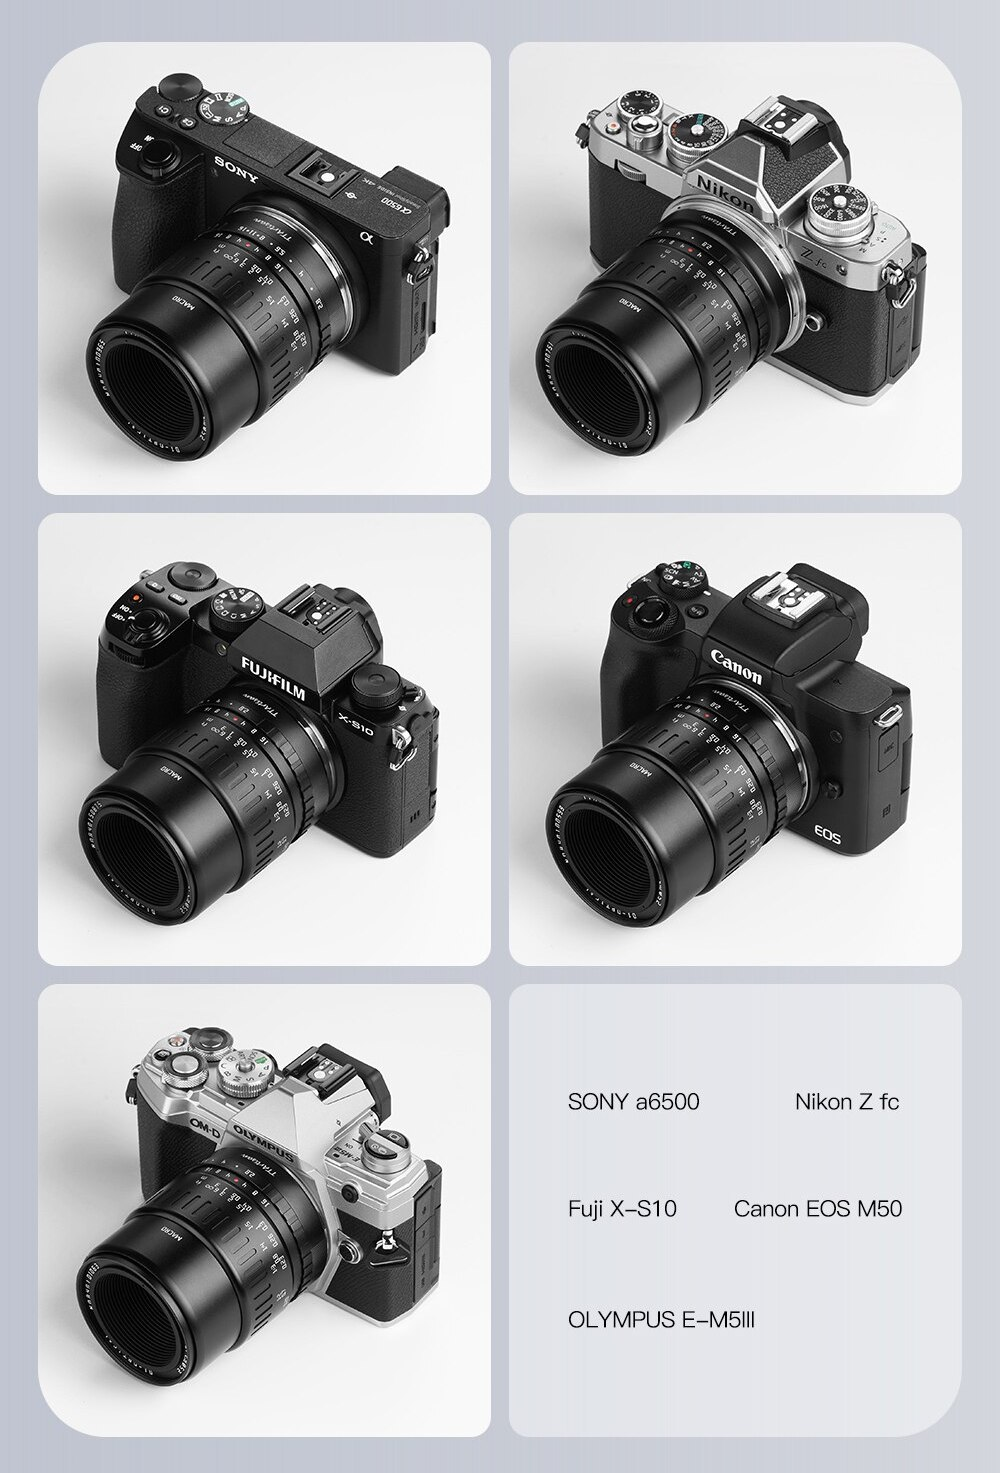 Пять фотоаппаратов с пятью типами креплений для объектива TTArtisan 40mm f/2.8